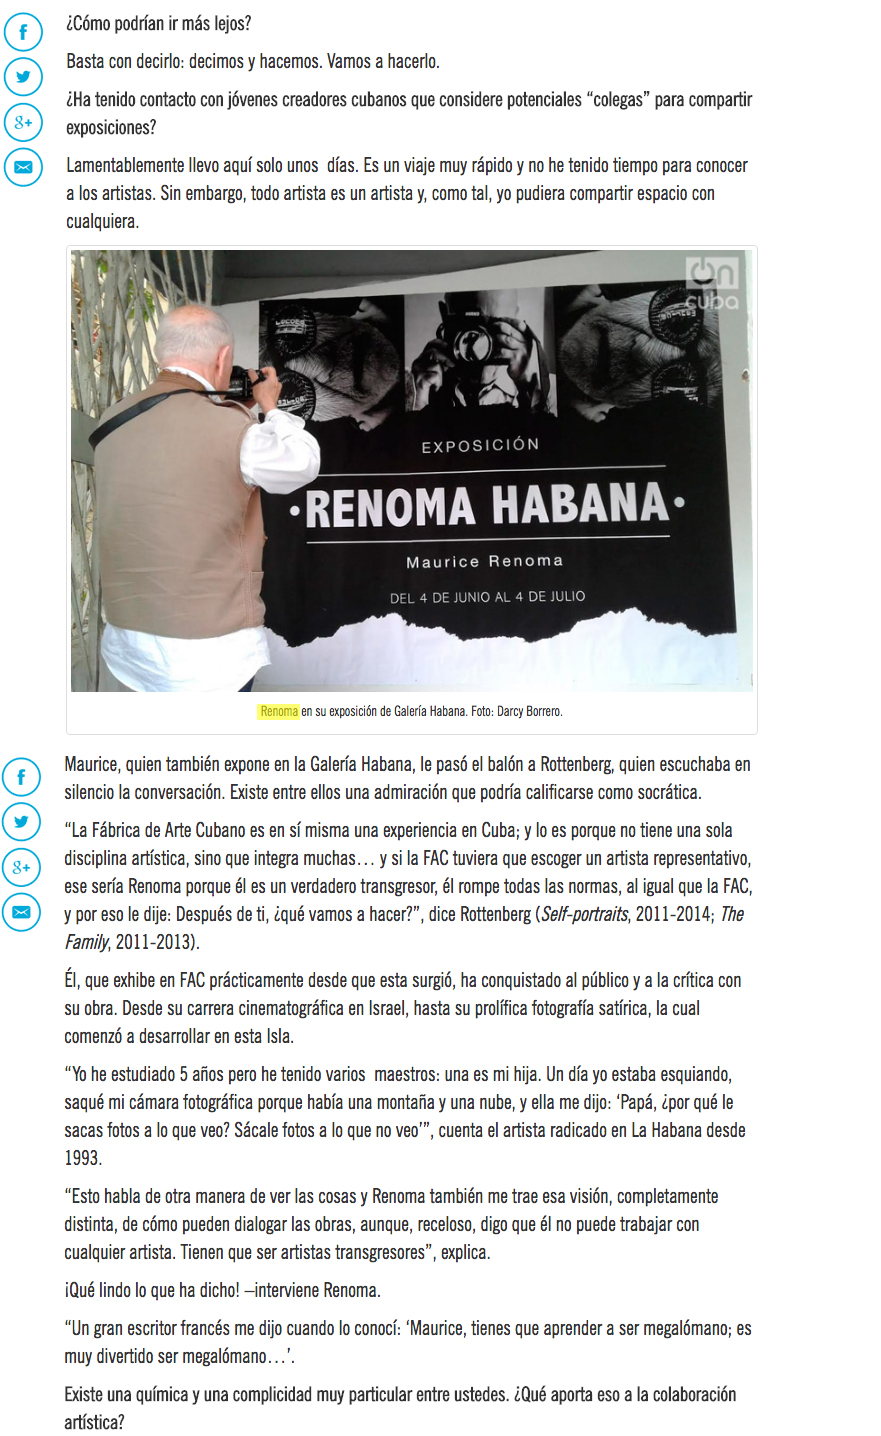 2017-06-08_On Cuba_2